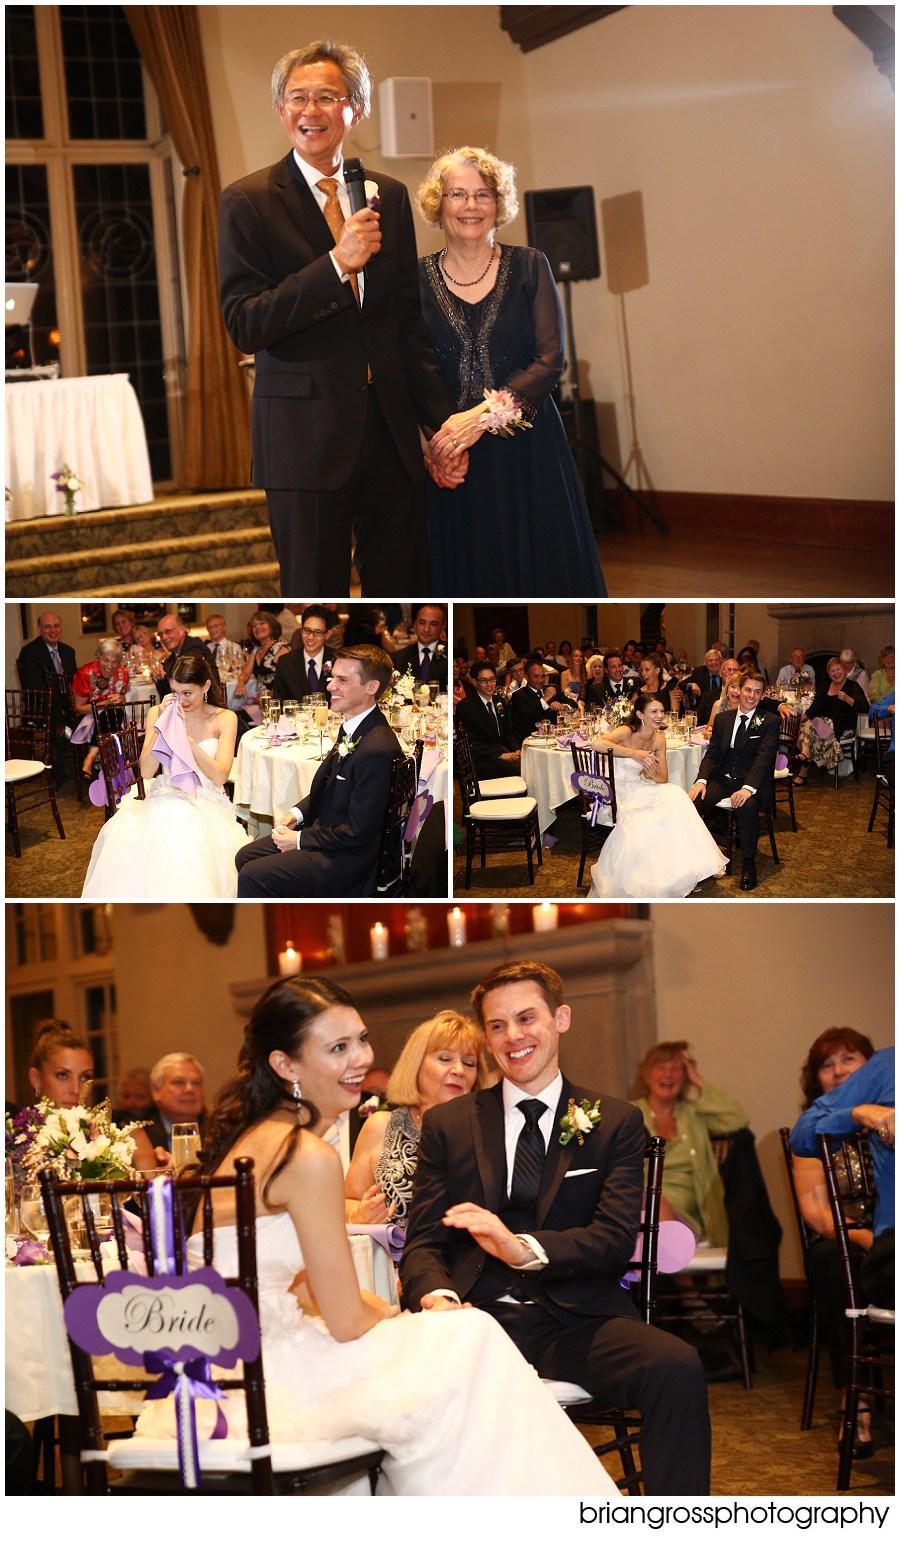 BlakeAndSarah_Wedding_BrianGrossPhotography-286